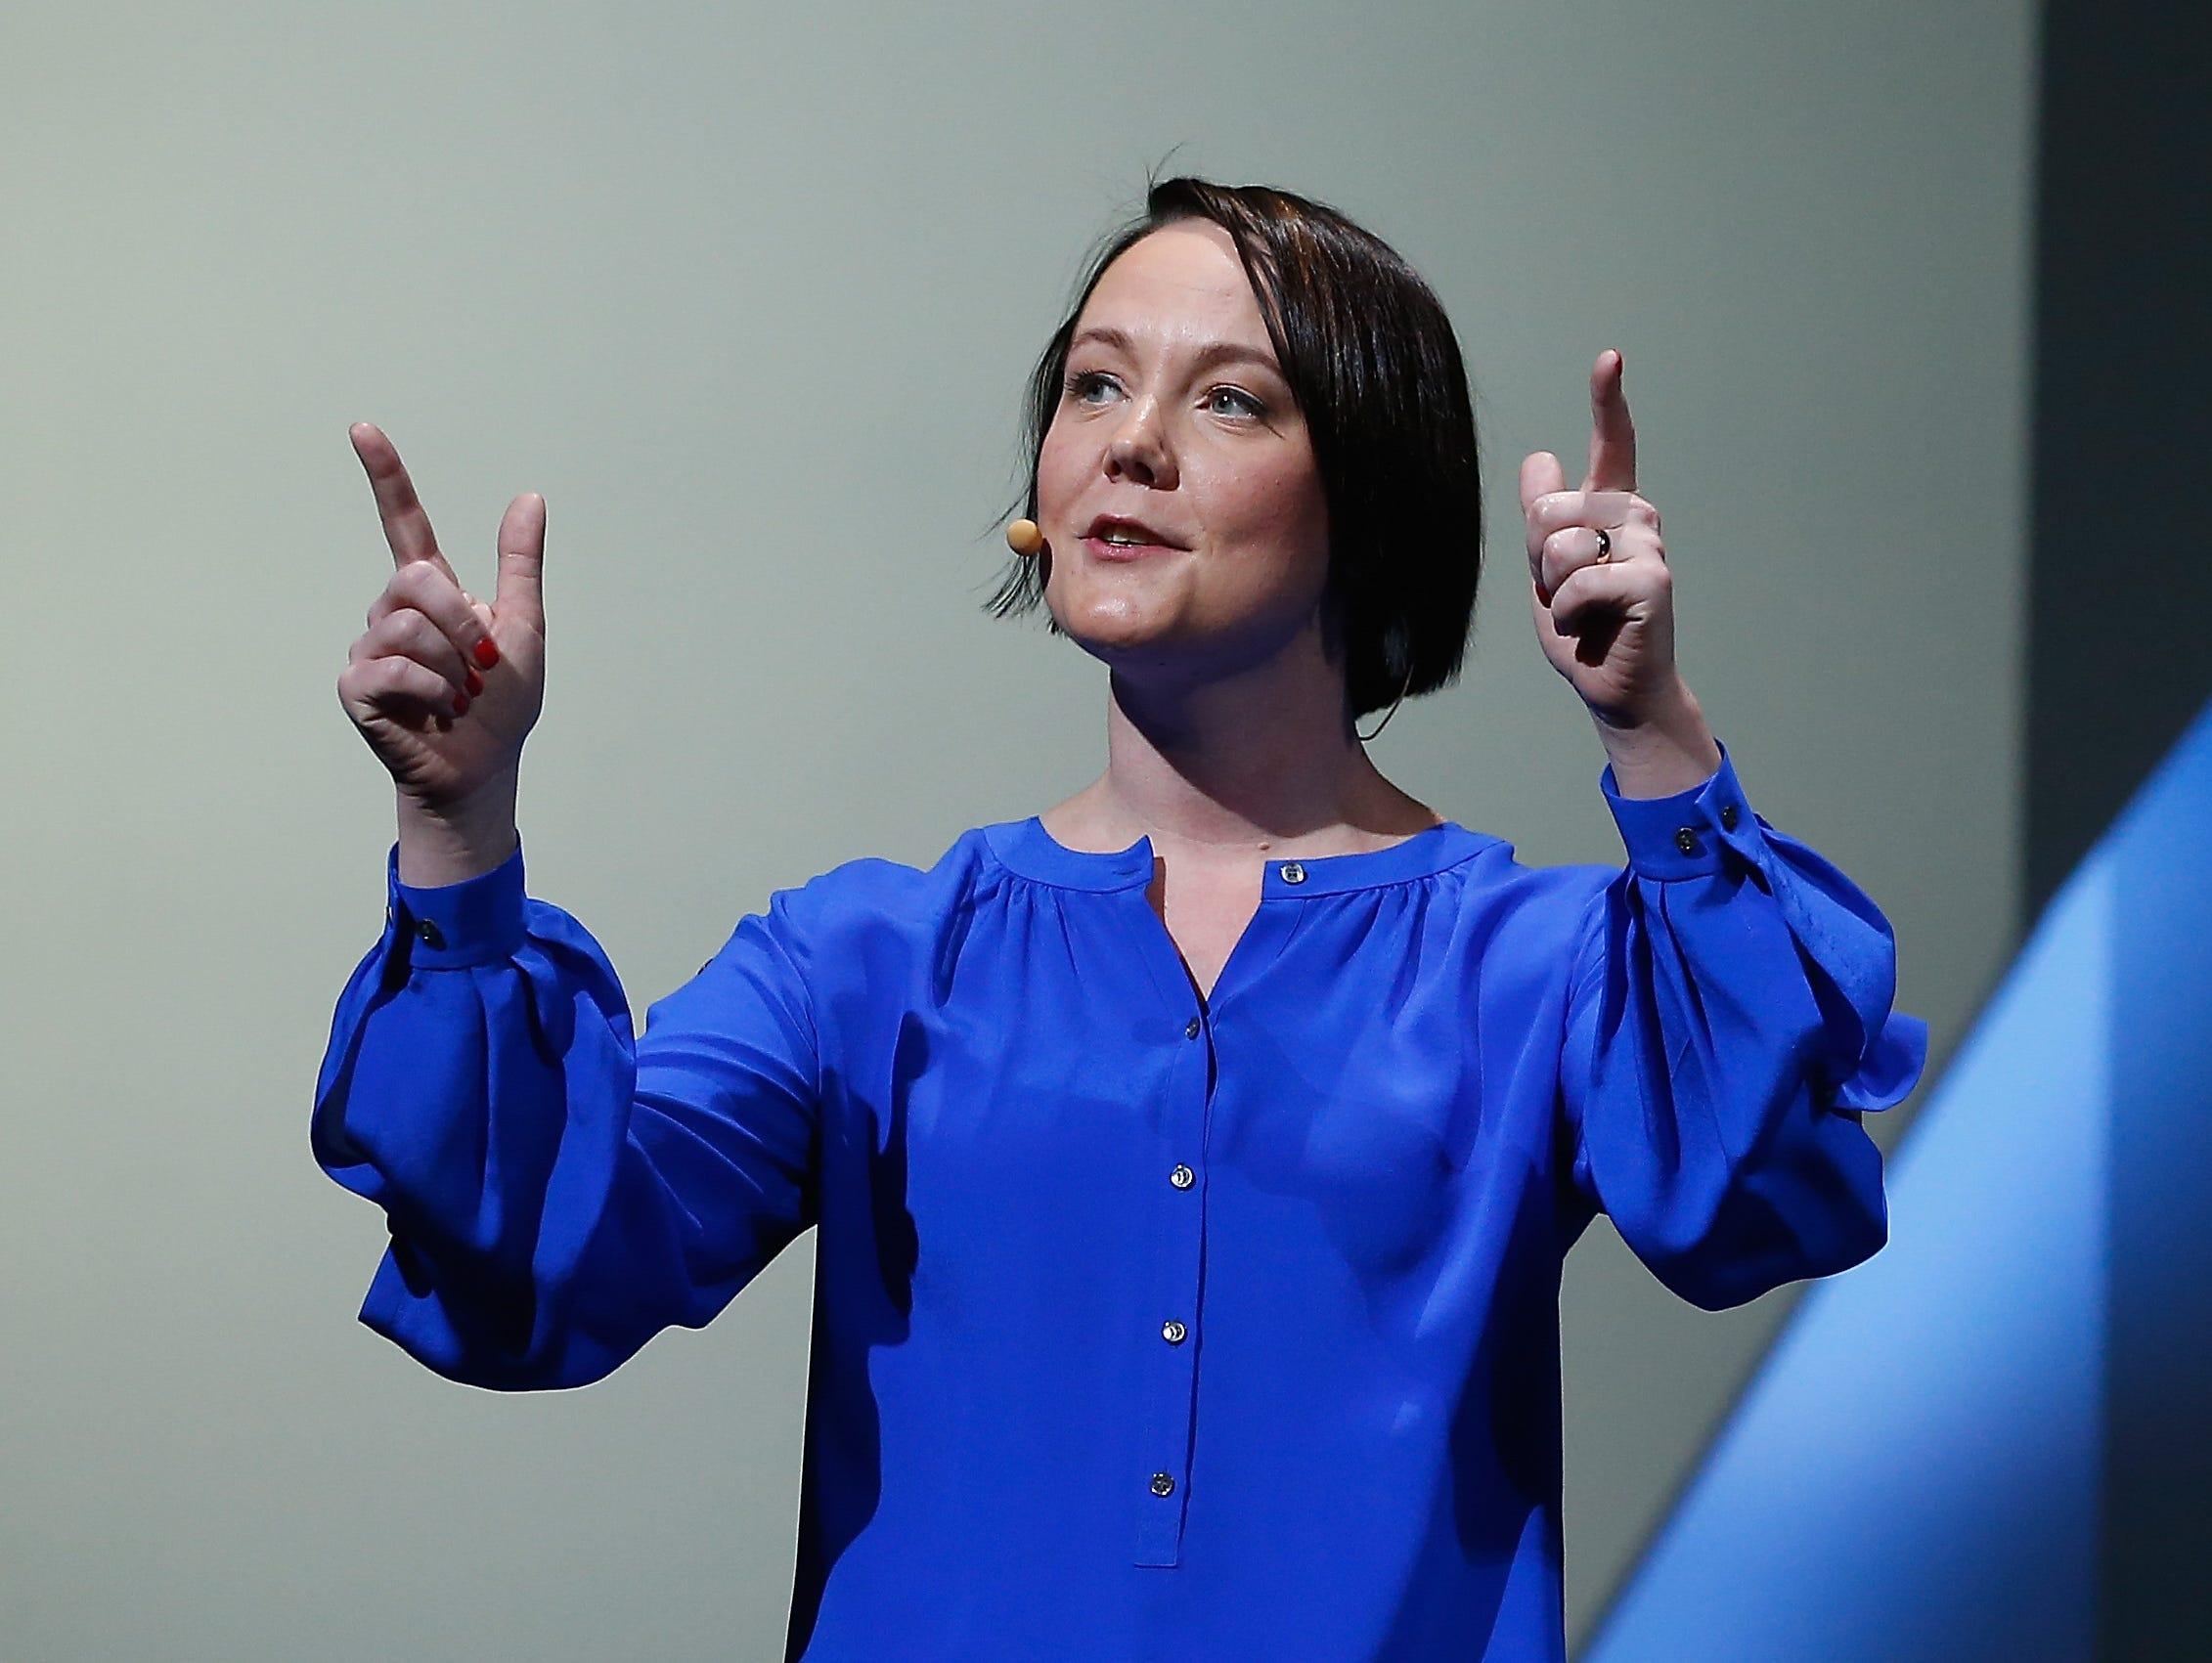 DICE senior producer Sigurlína Ingvarsdottir introduces 'Star Wars Battlefront' during the Electronic Arts E3 press conference.